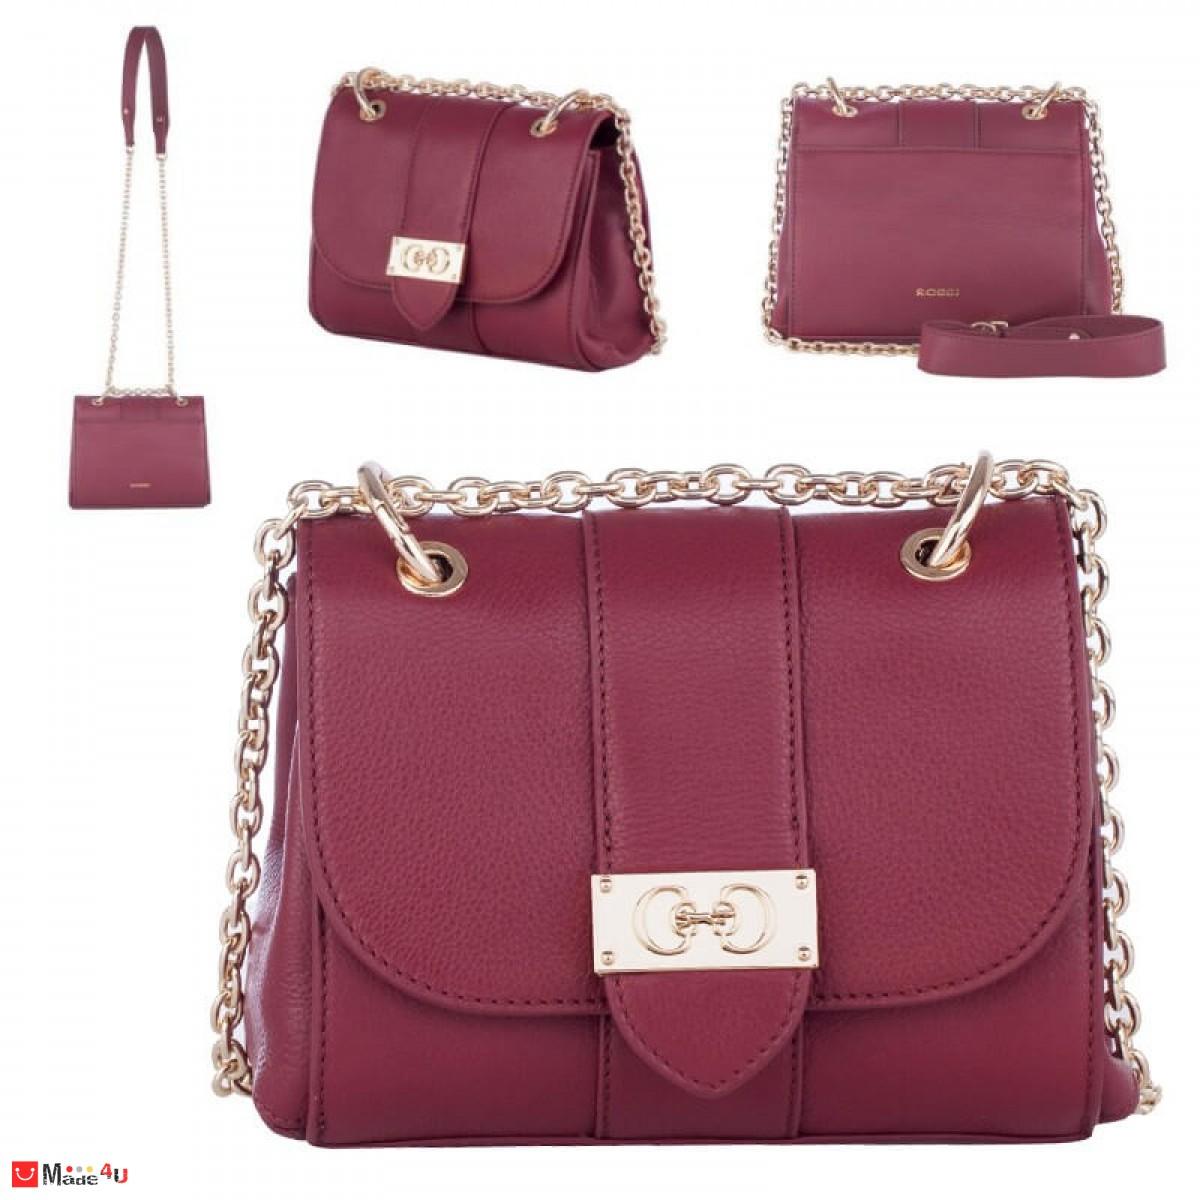 Дамска чанта през рамо 20х17см, винено червена